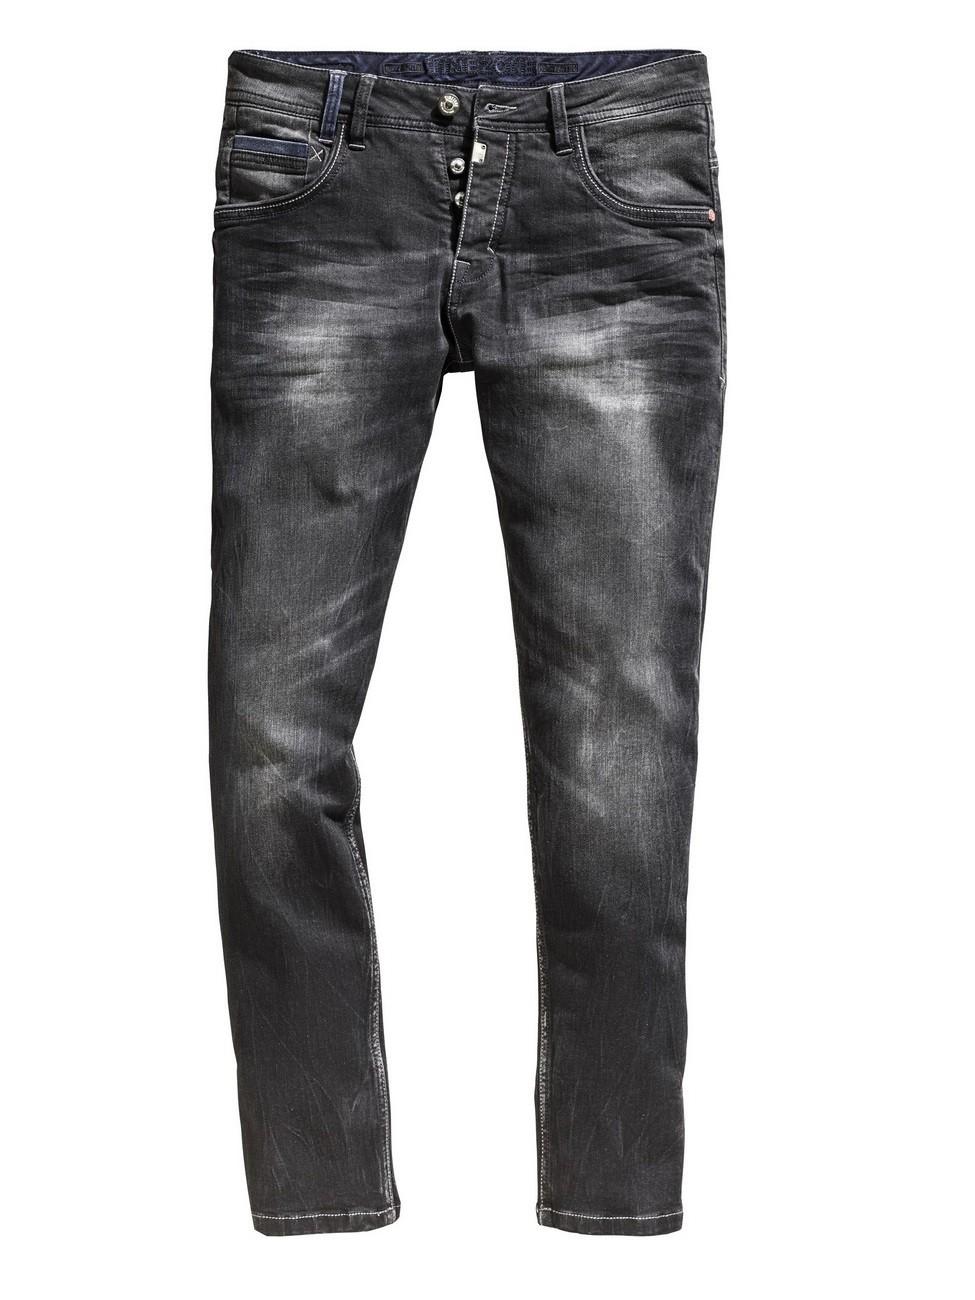 timezone herren jeans gerrittz regular fit schwarz pirate wash ebay. Black Bedroom Furniture Sets. Home Design Ideas